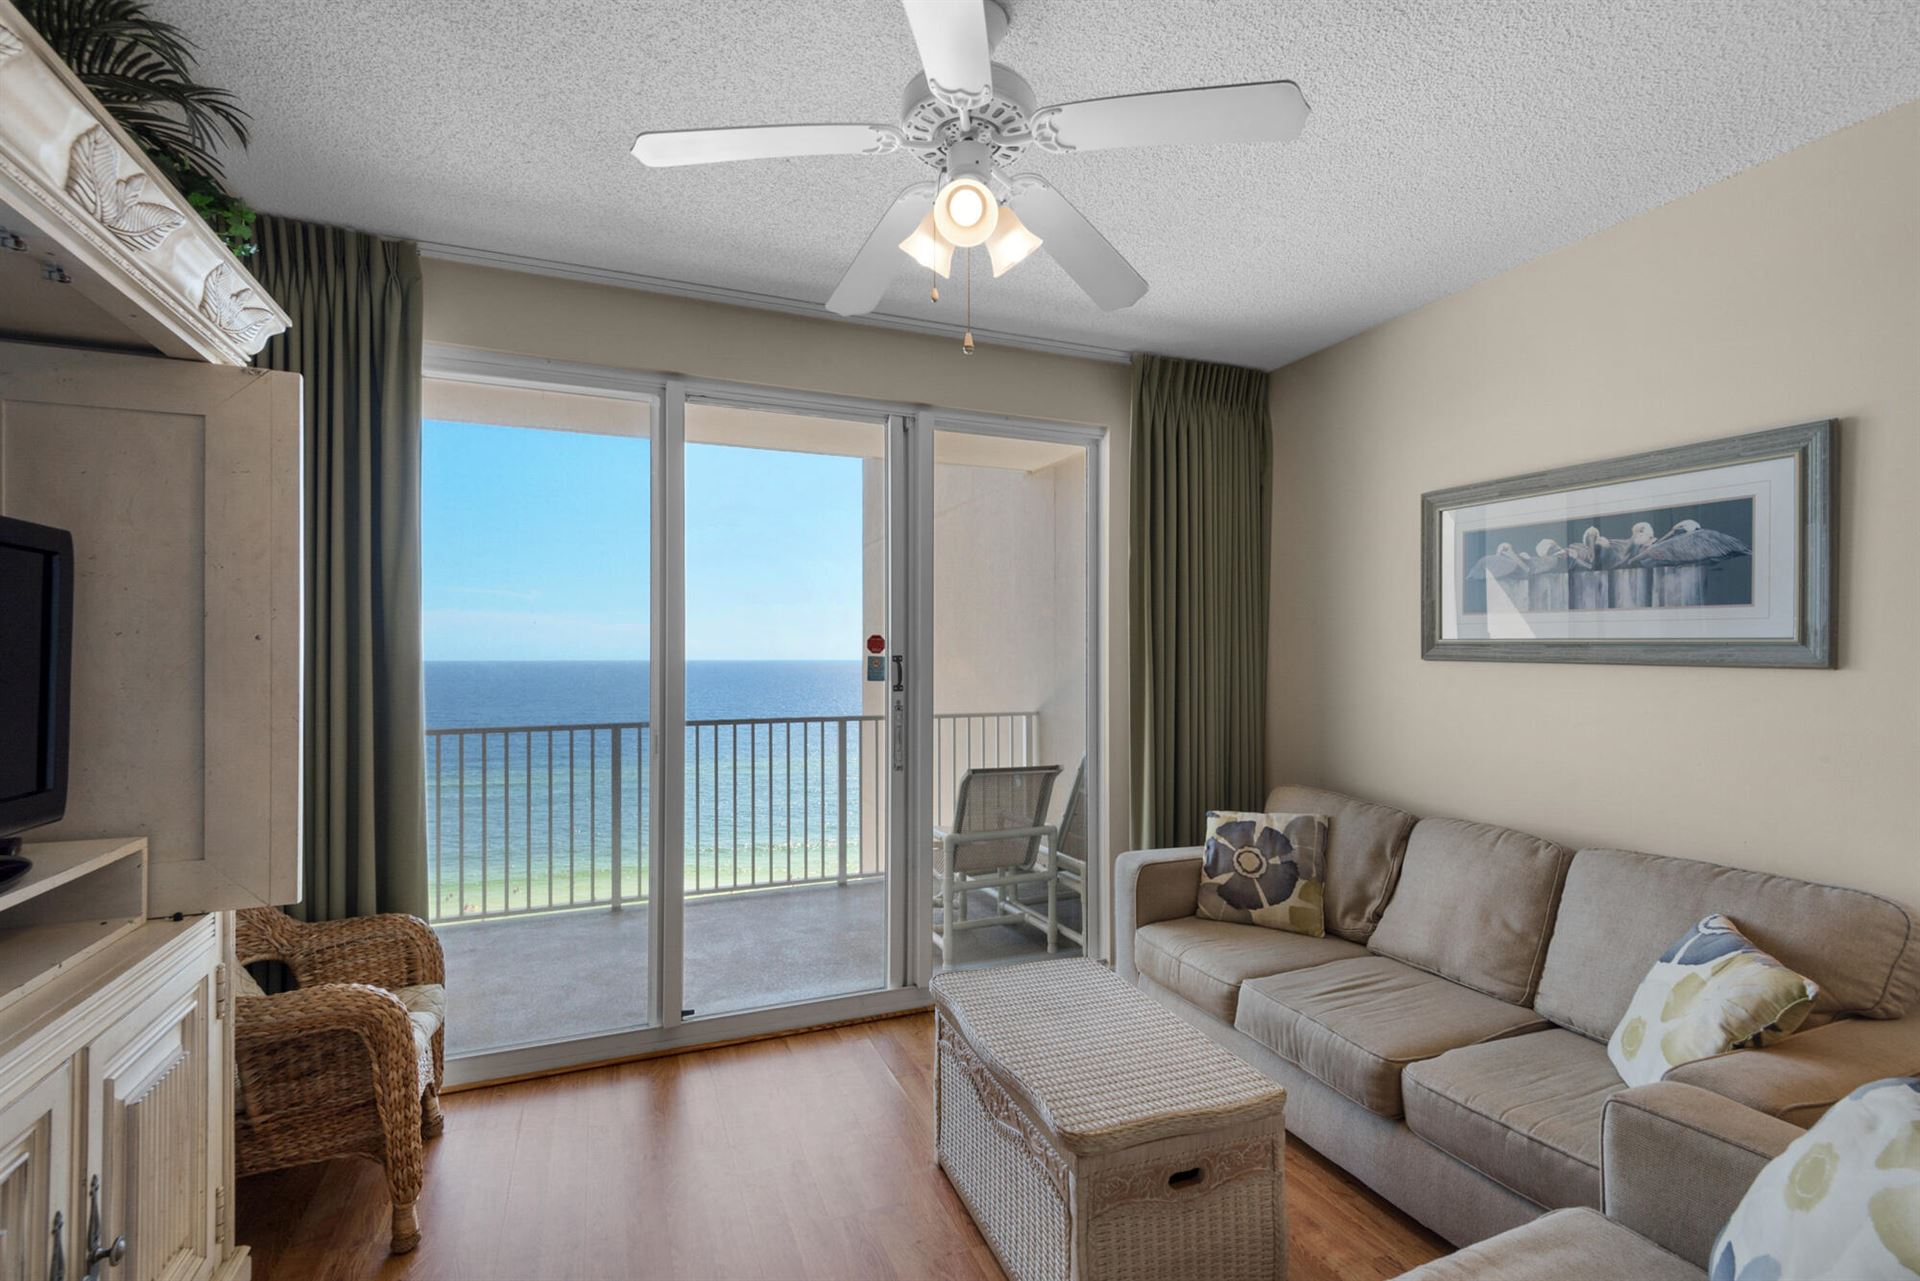 1200 Scenic Gulf Drive #UNIT B1103                                                                               Miramar Beach                                                                      , FL - $630,000